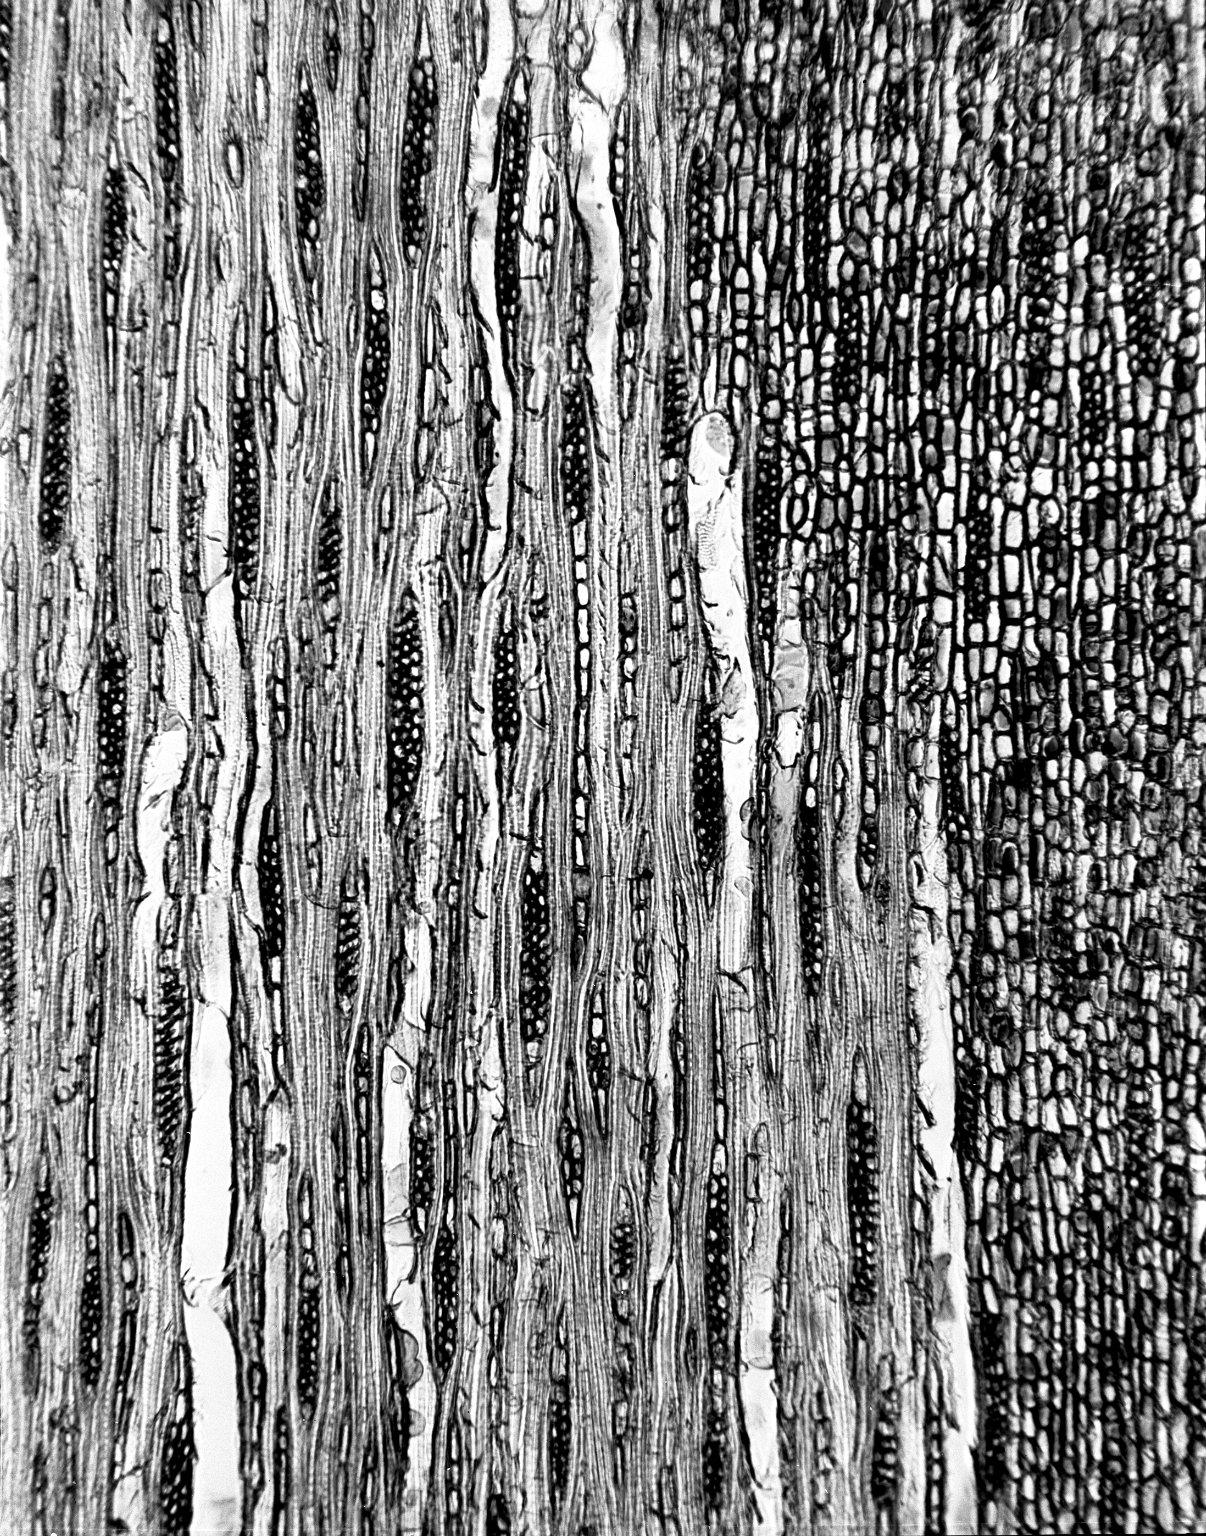 CELASTRACEAE Pleurostylia capensis